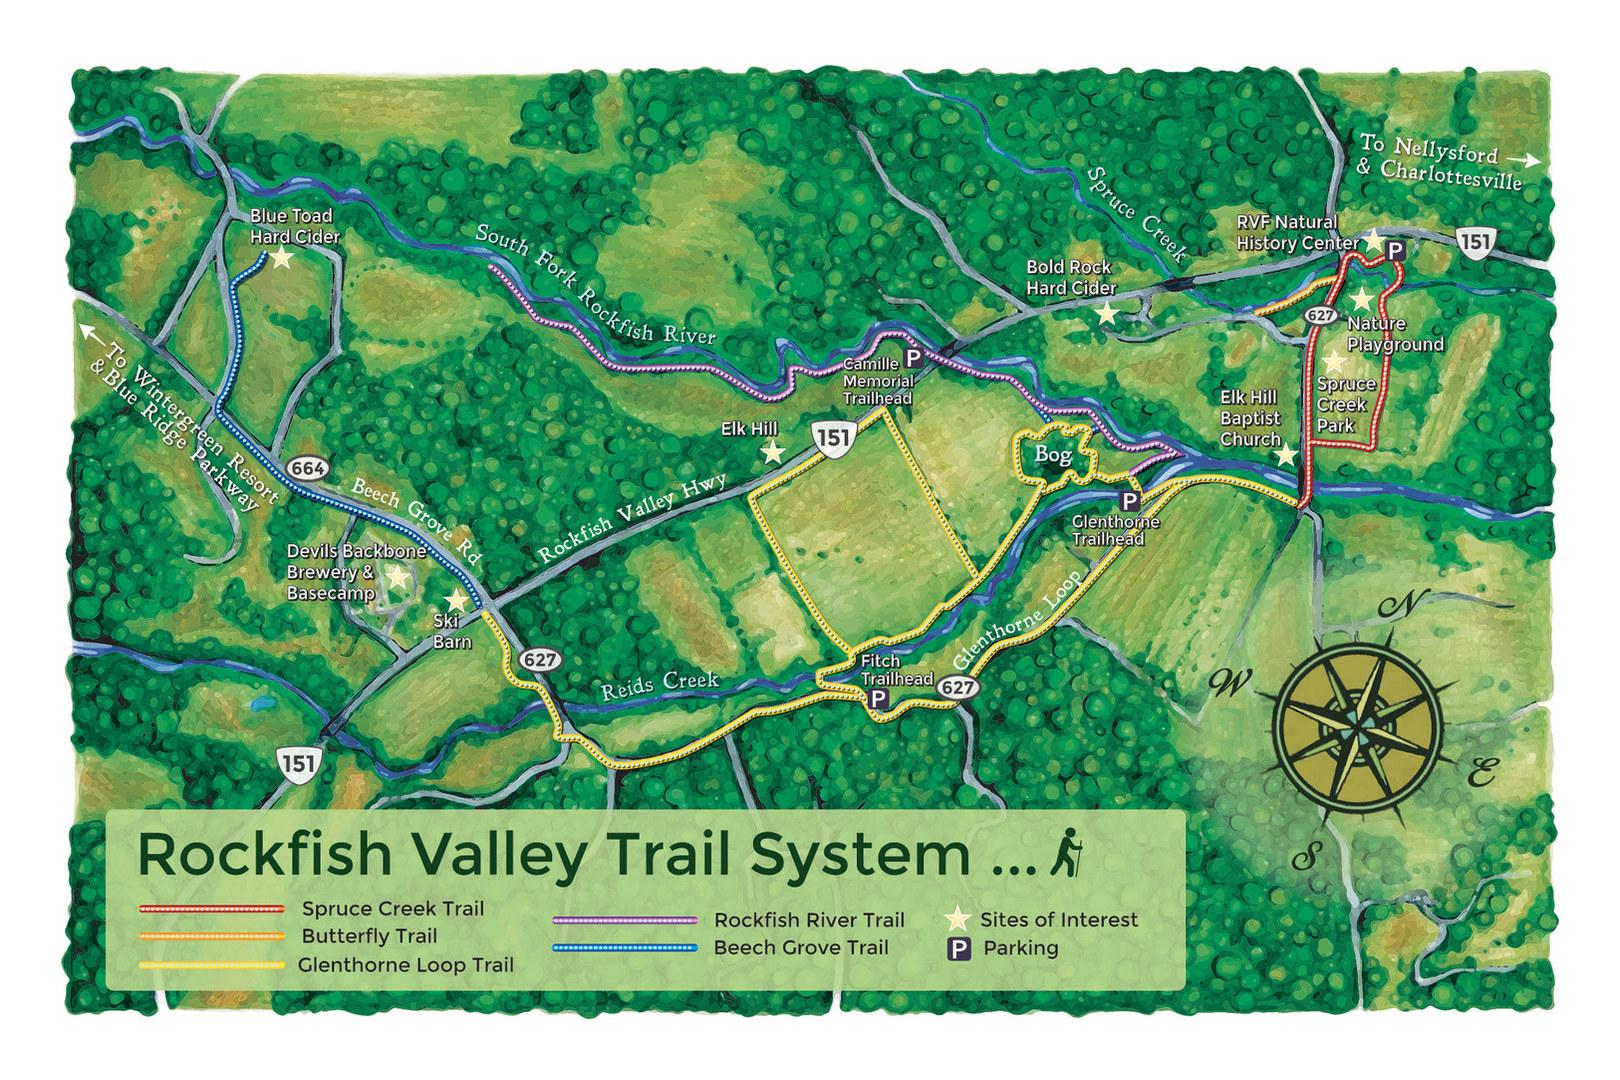 Rockfish Valley Trail Map.jpg